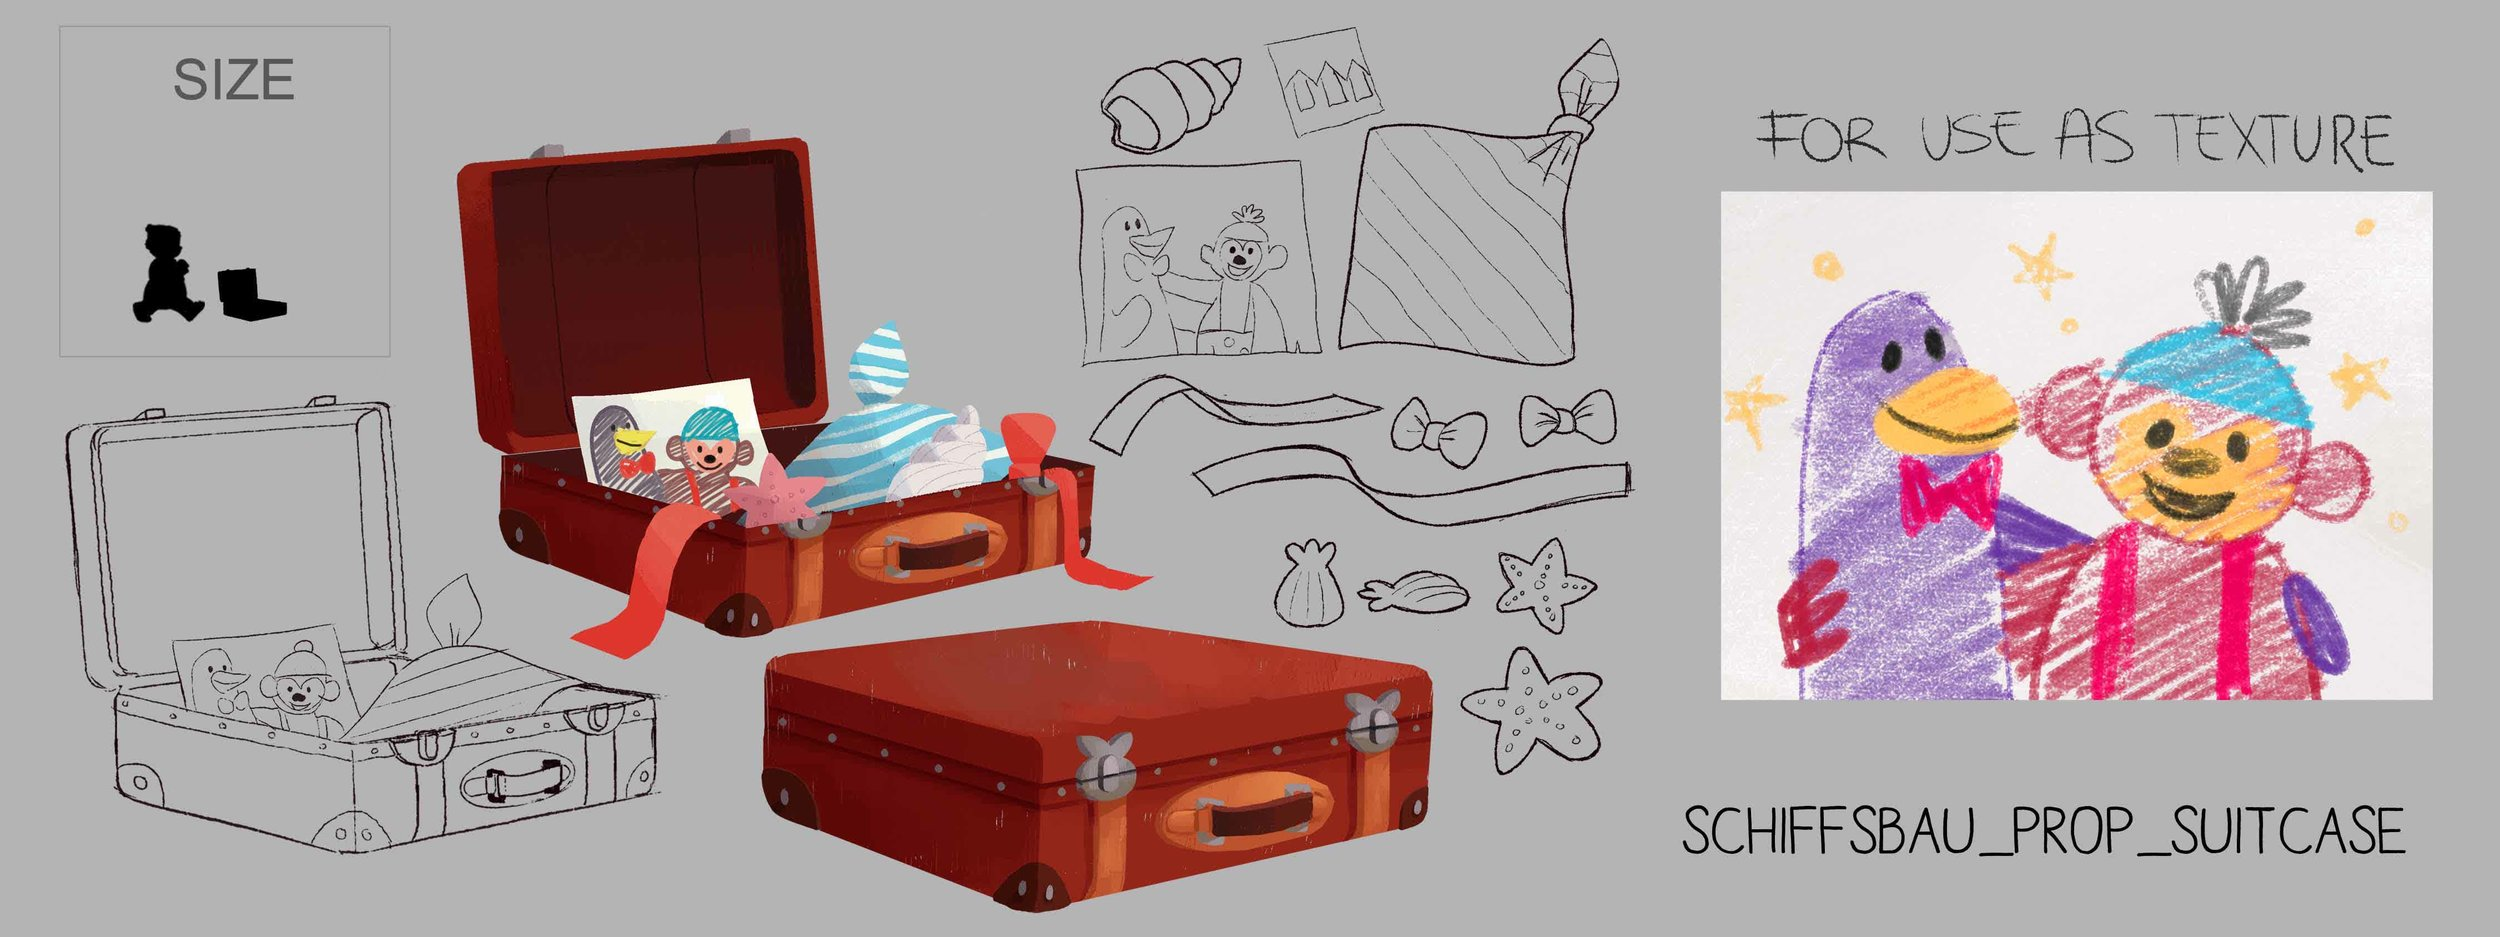 PROPS_Suitcase_DESIGN_SCHIFFSBAUPropSuitcase.v000_thumb.jpg